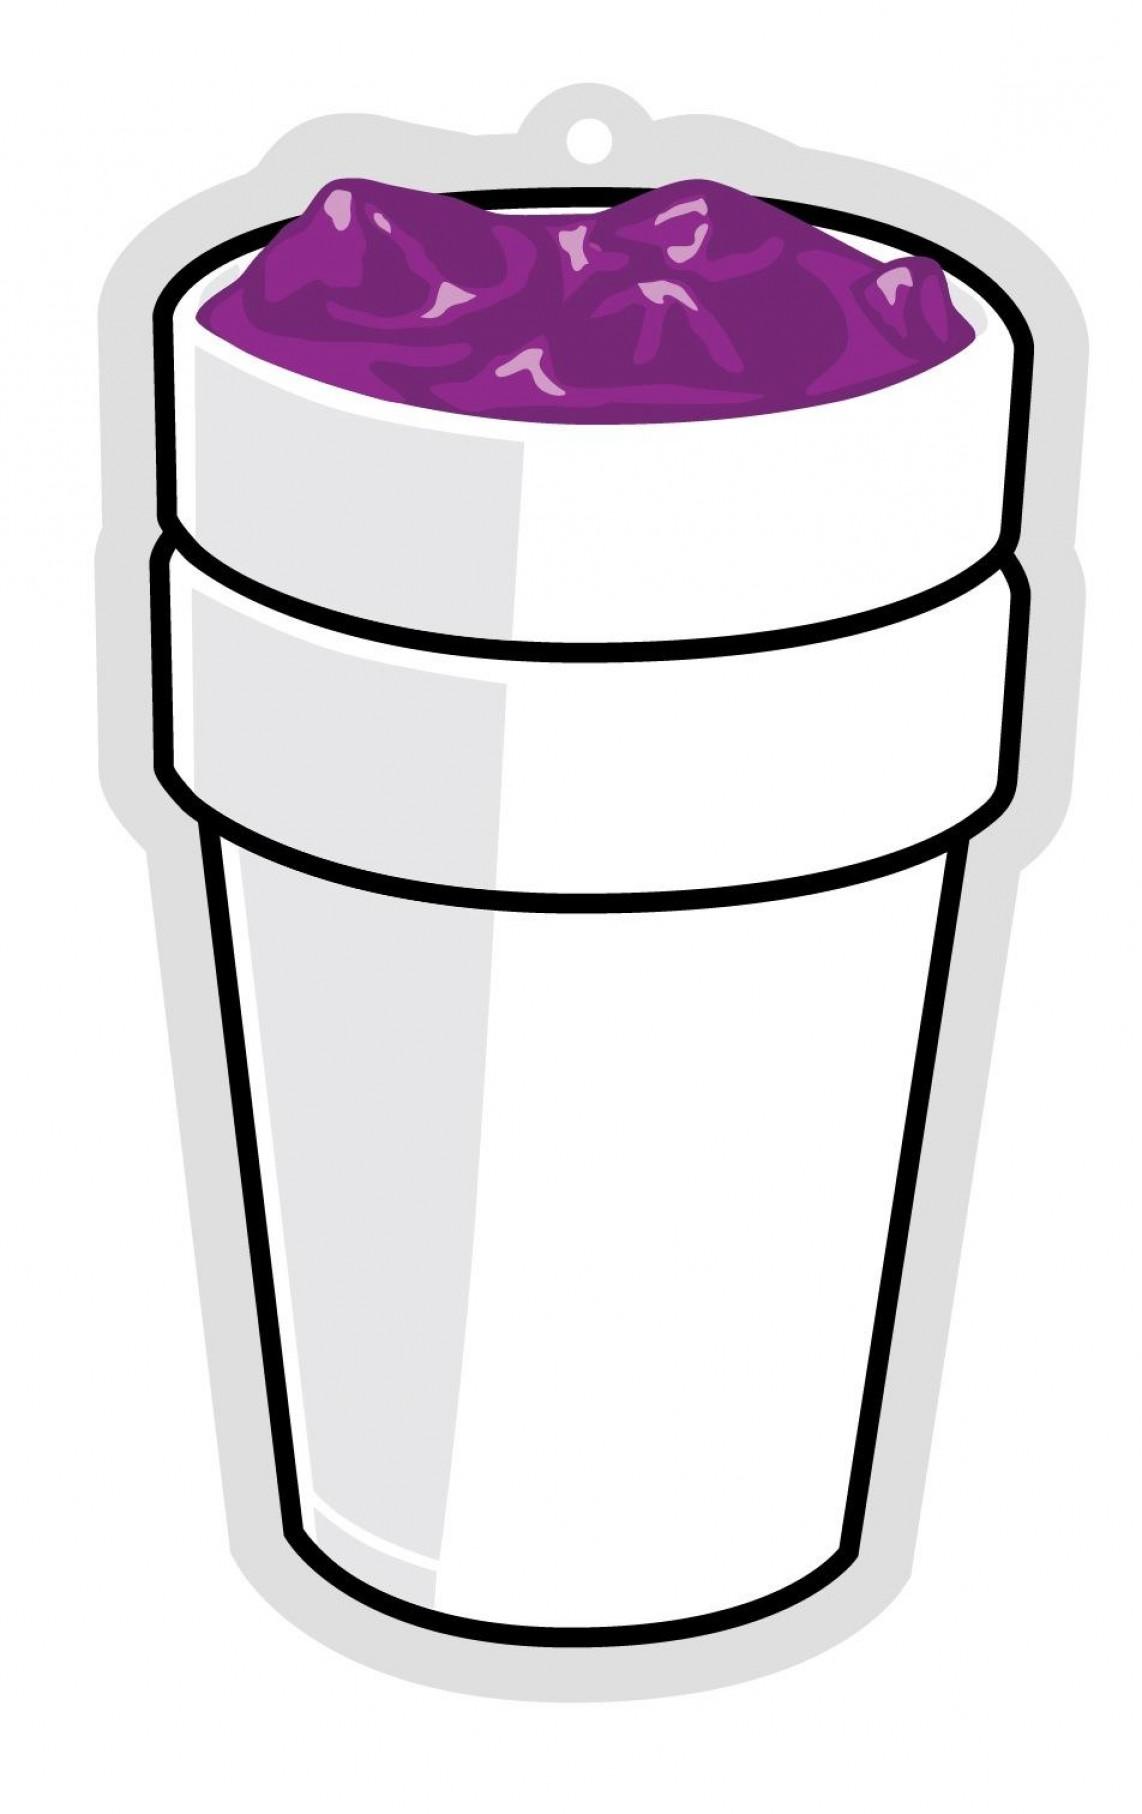 Hd Soda Clipart Styrofoam Cup Image.